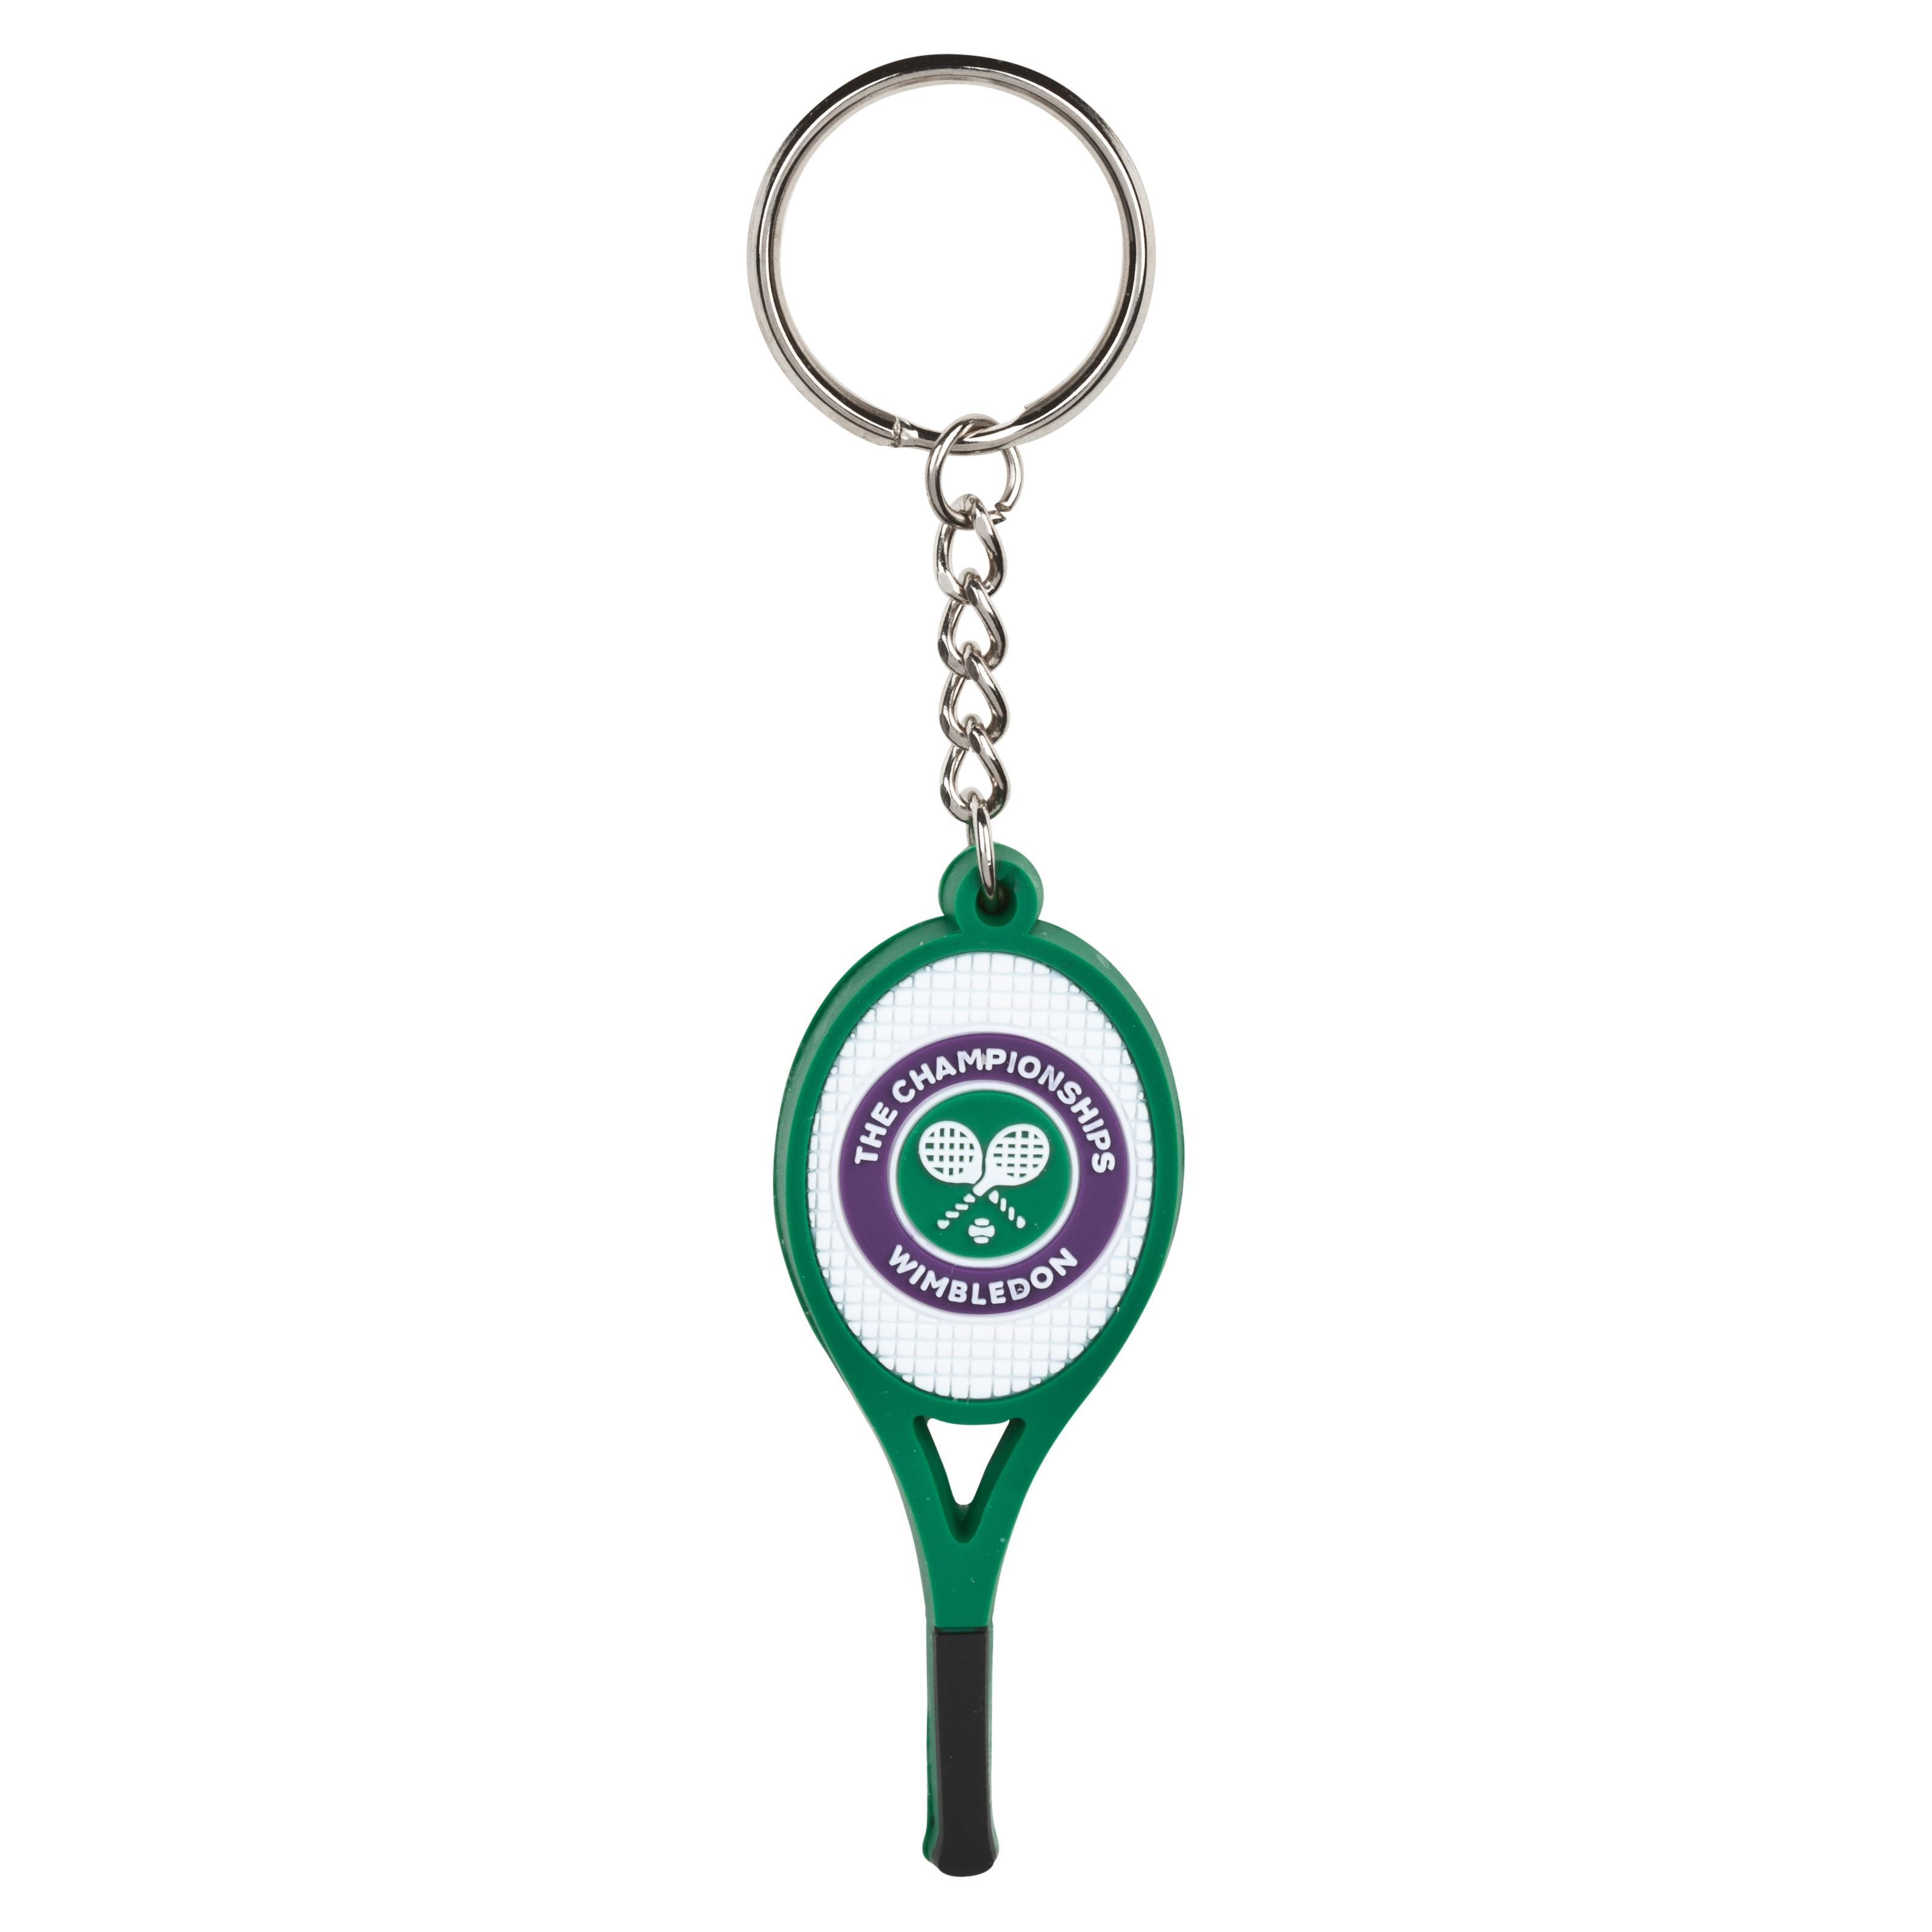 Wimbledon PVC Tennis Racket Keyring - Green